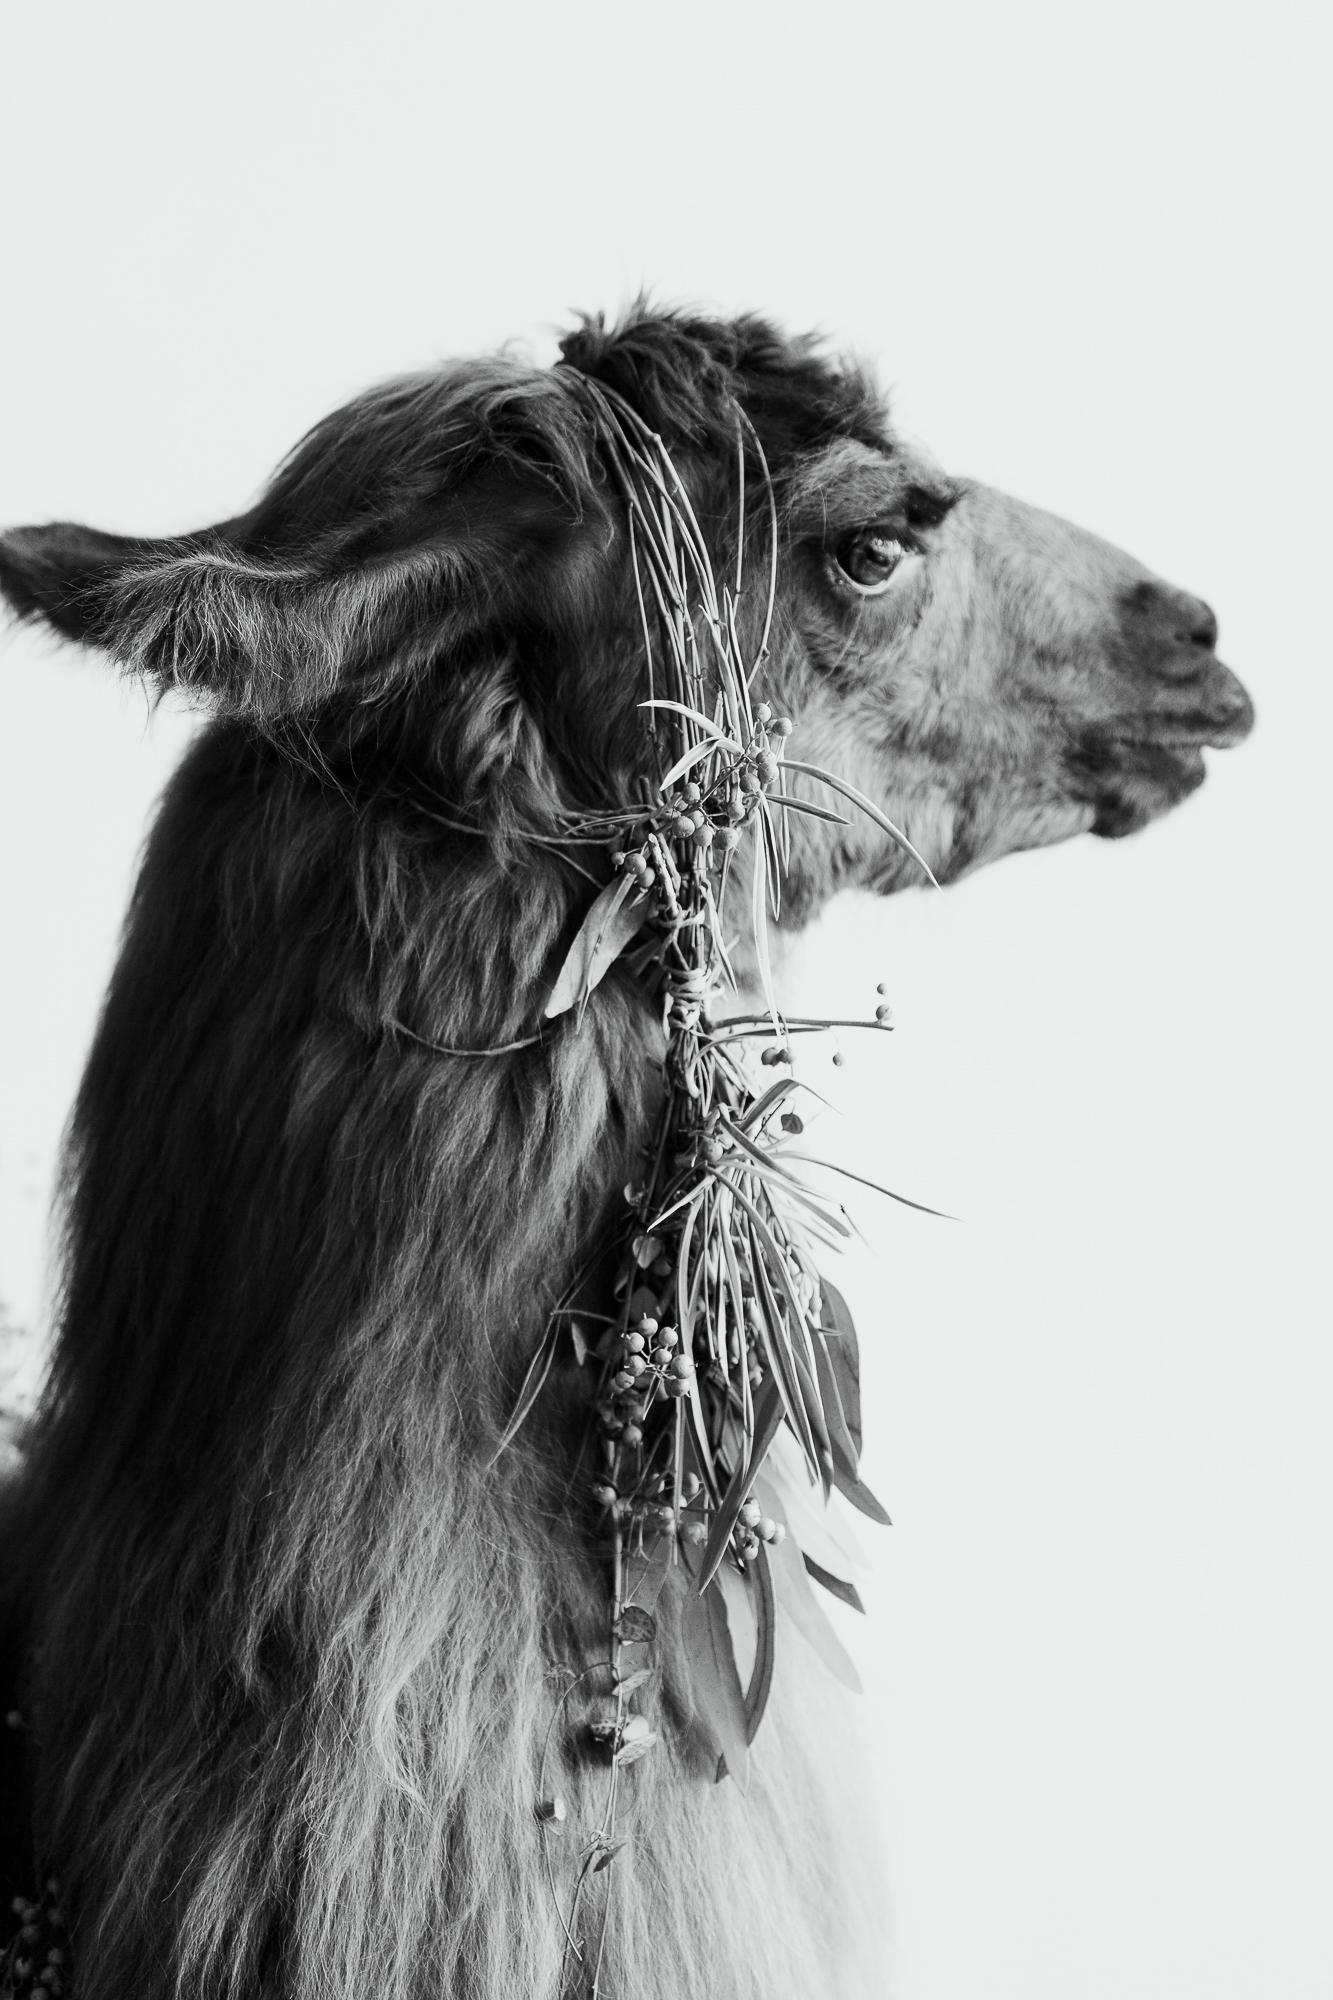 llama_portland_animal-11.JPG